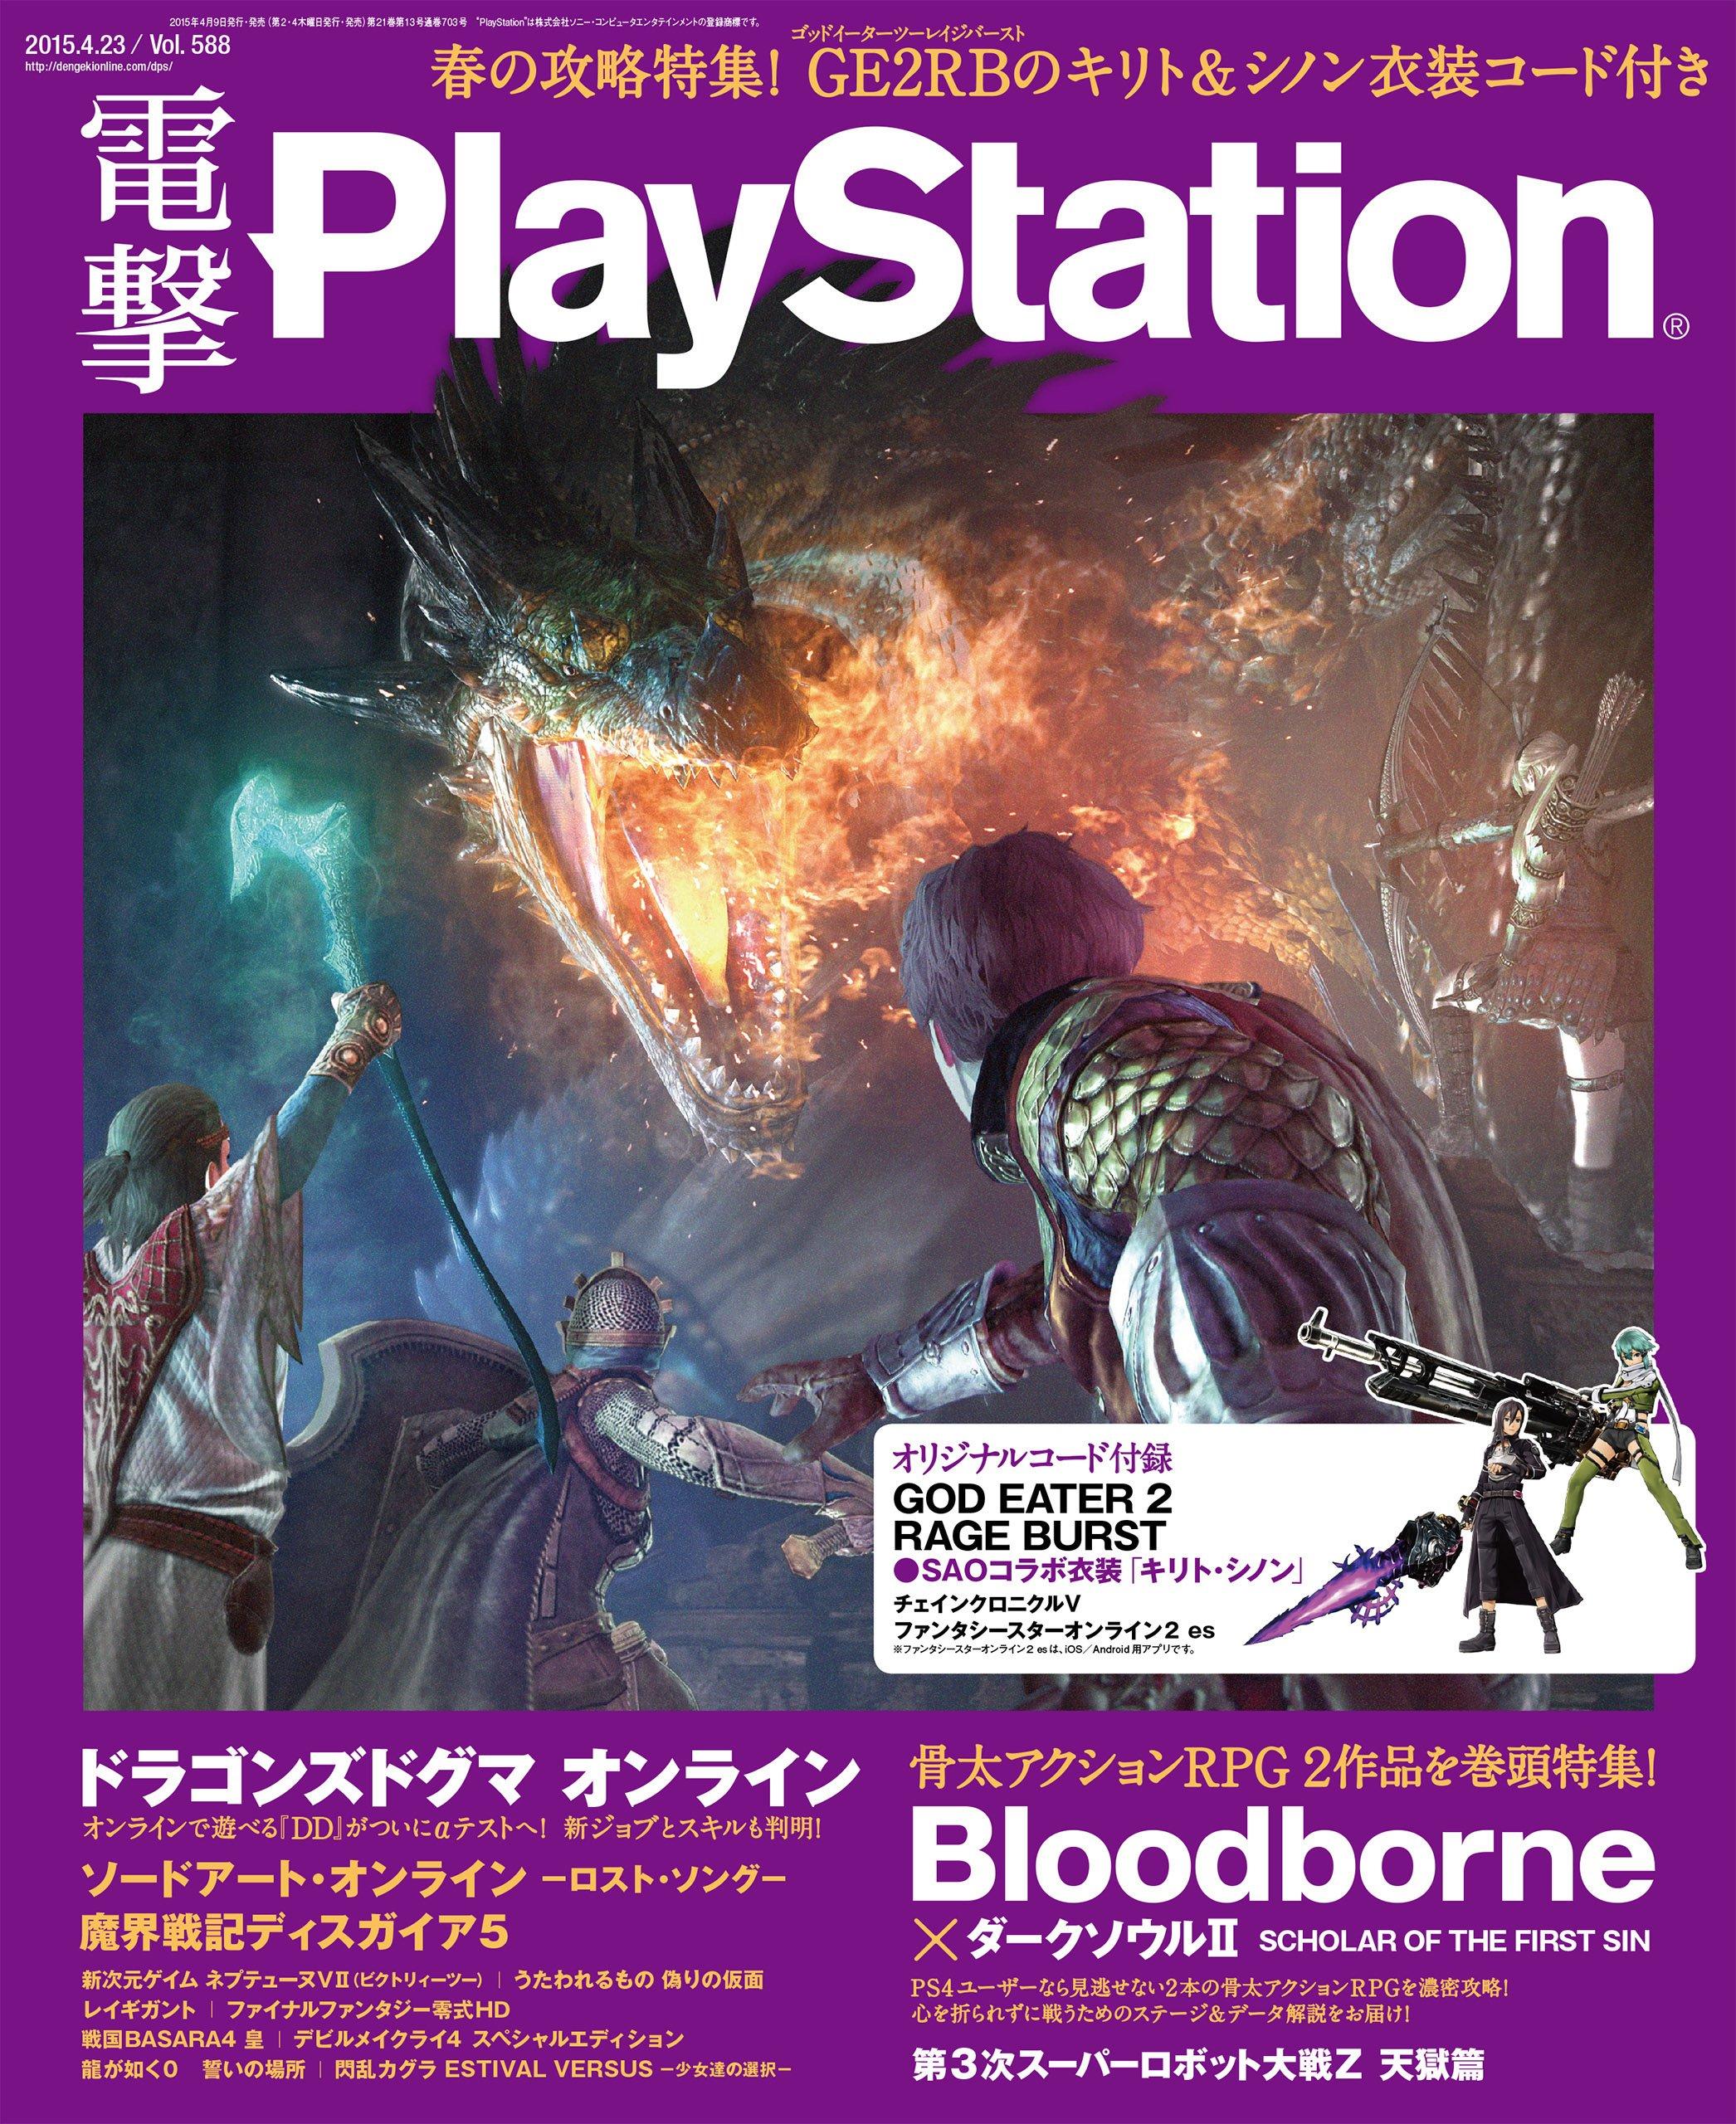 Dengeki PlayStation 588 (April 23, 2015)